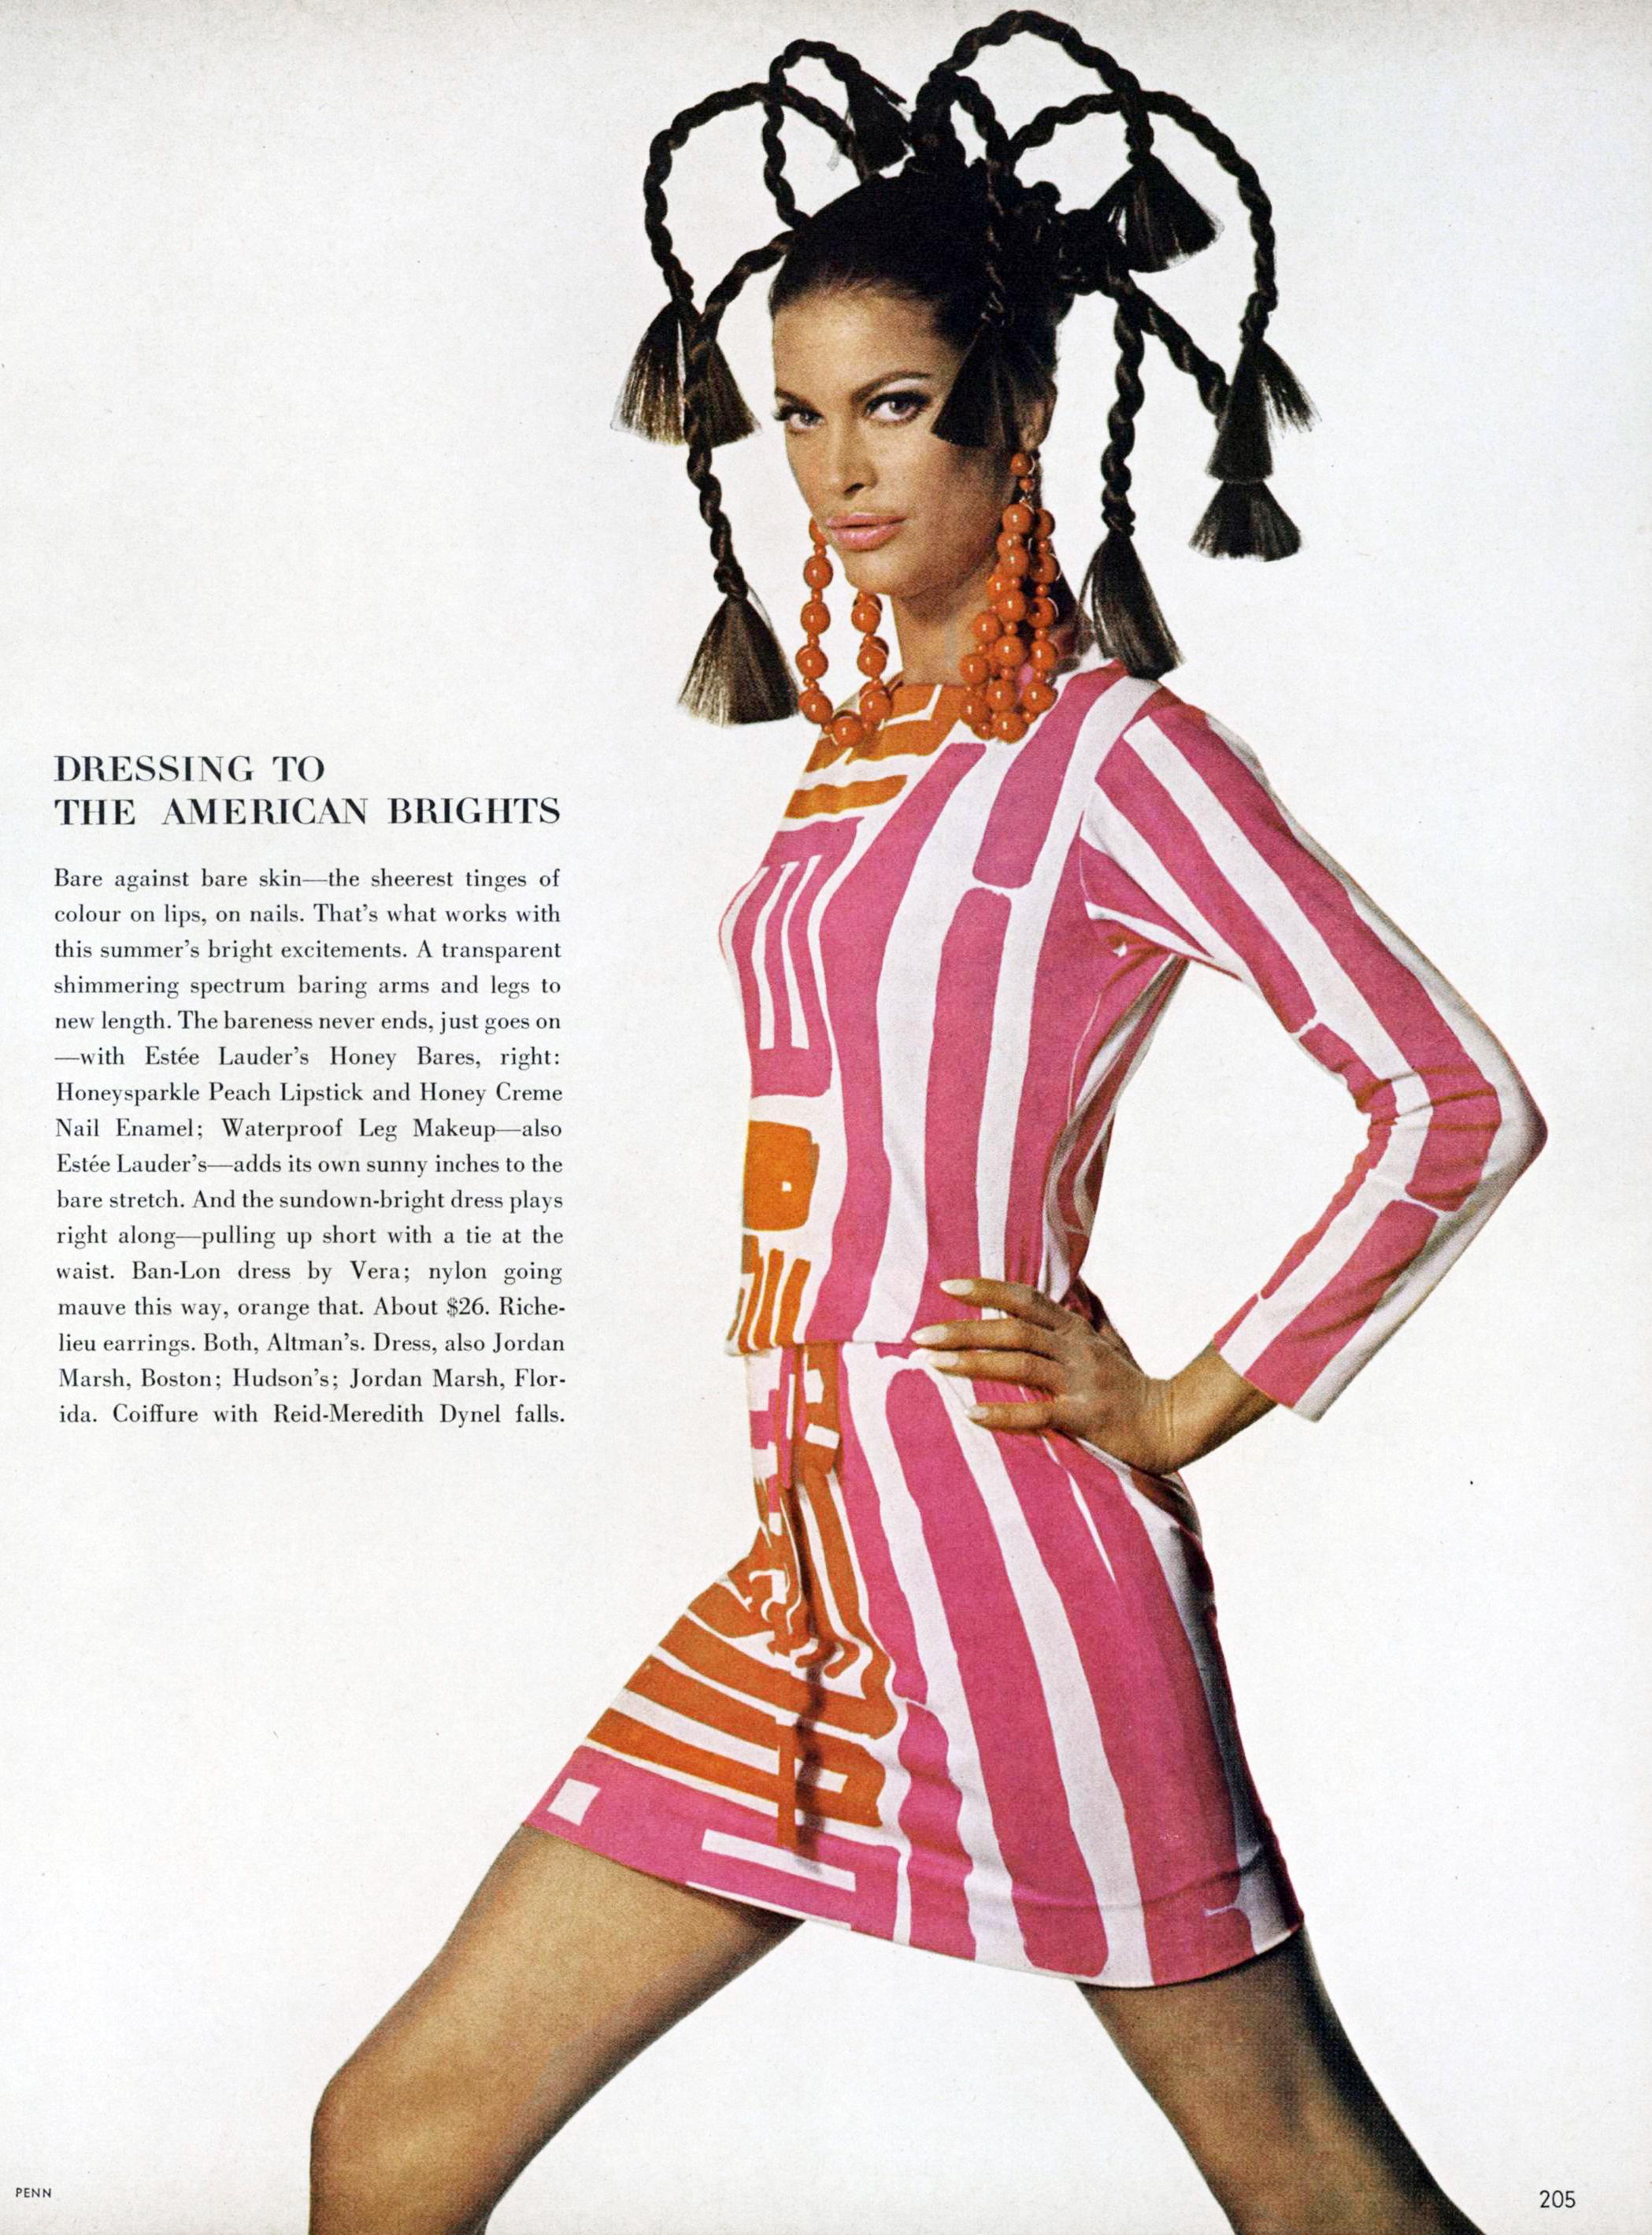 Vogue149.9 (May 1, 1967)_PENN_205.JPG